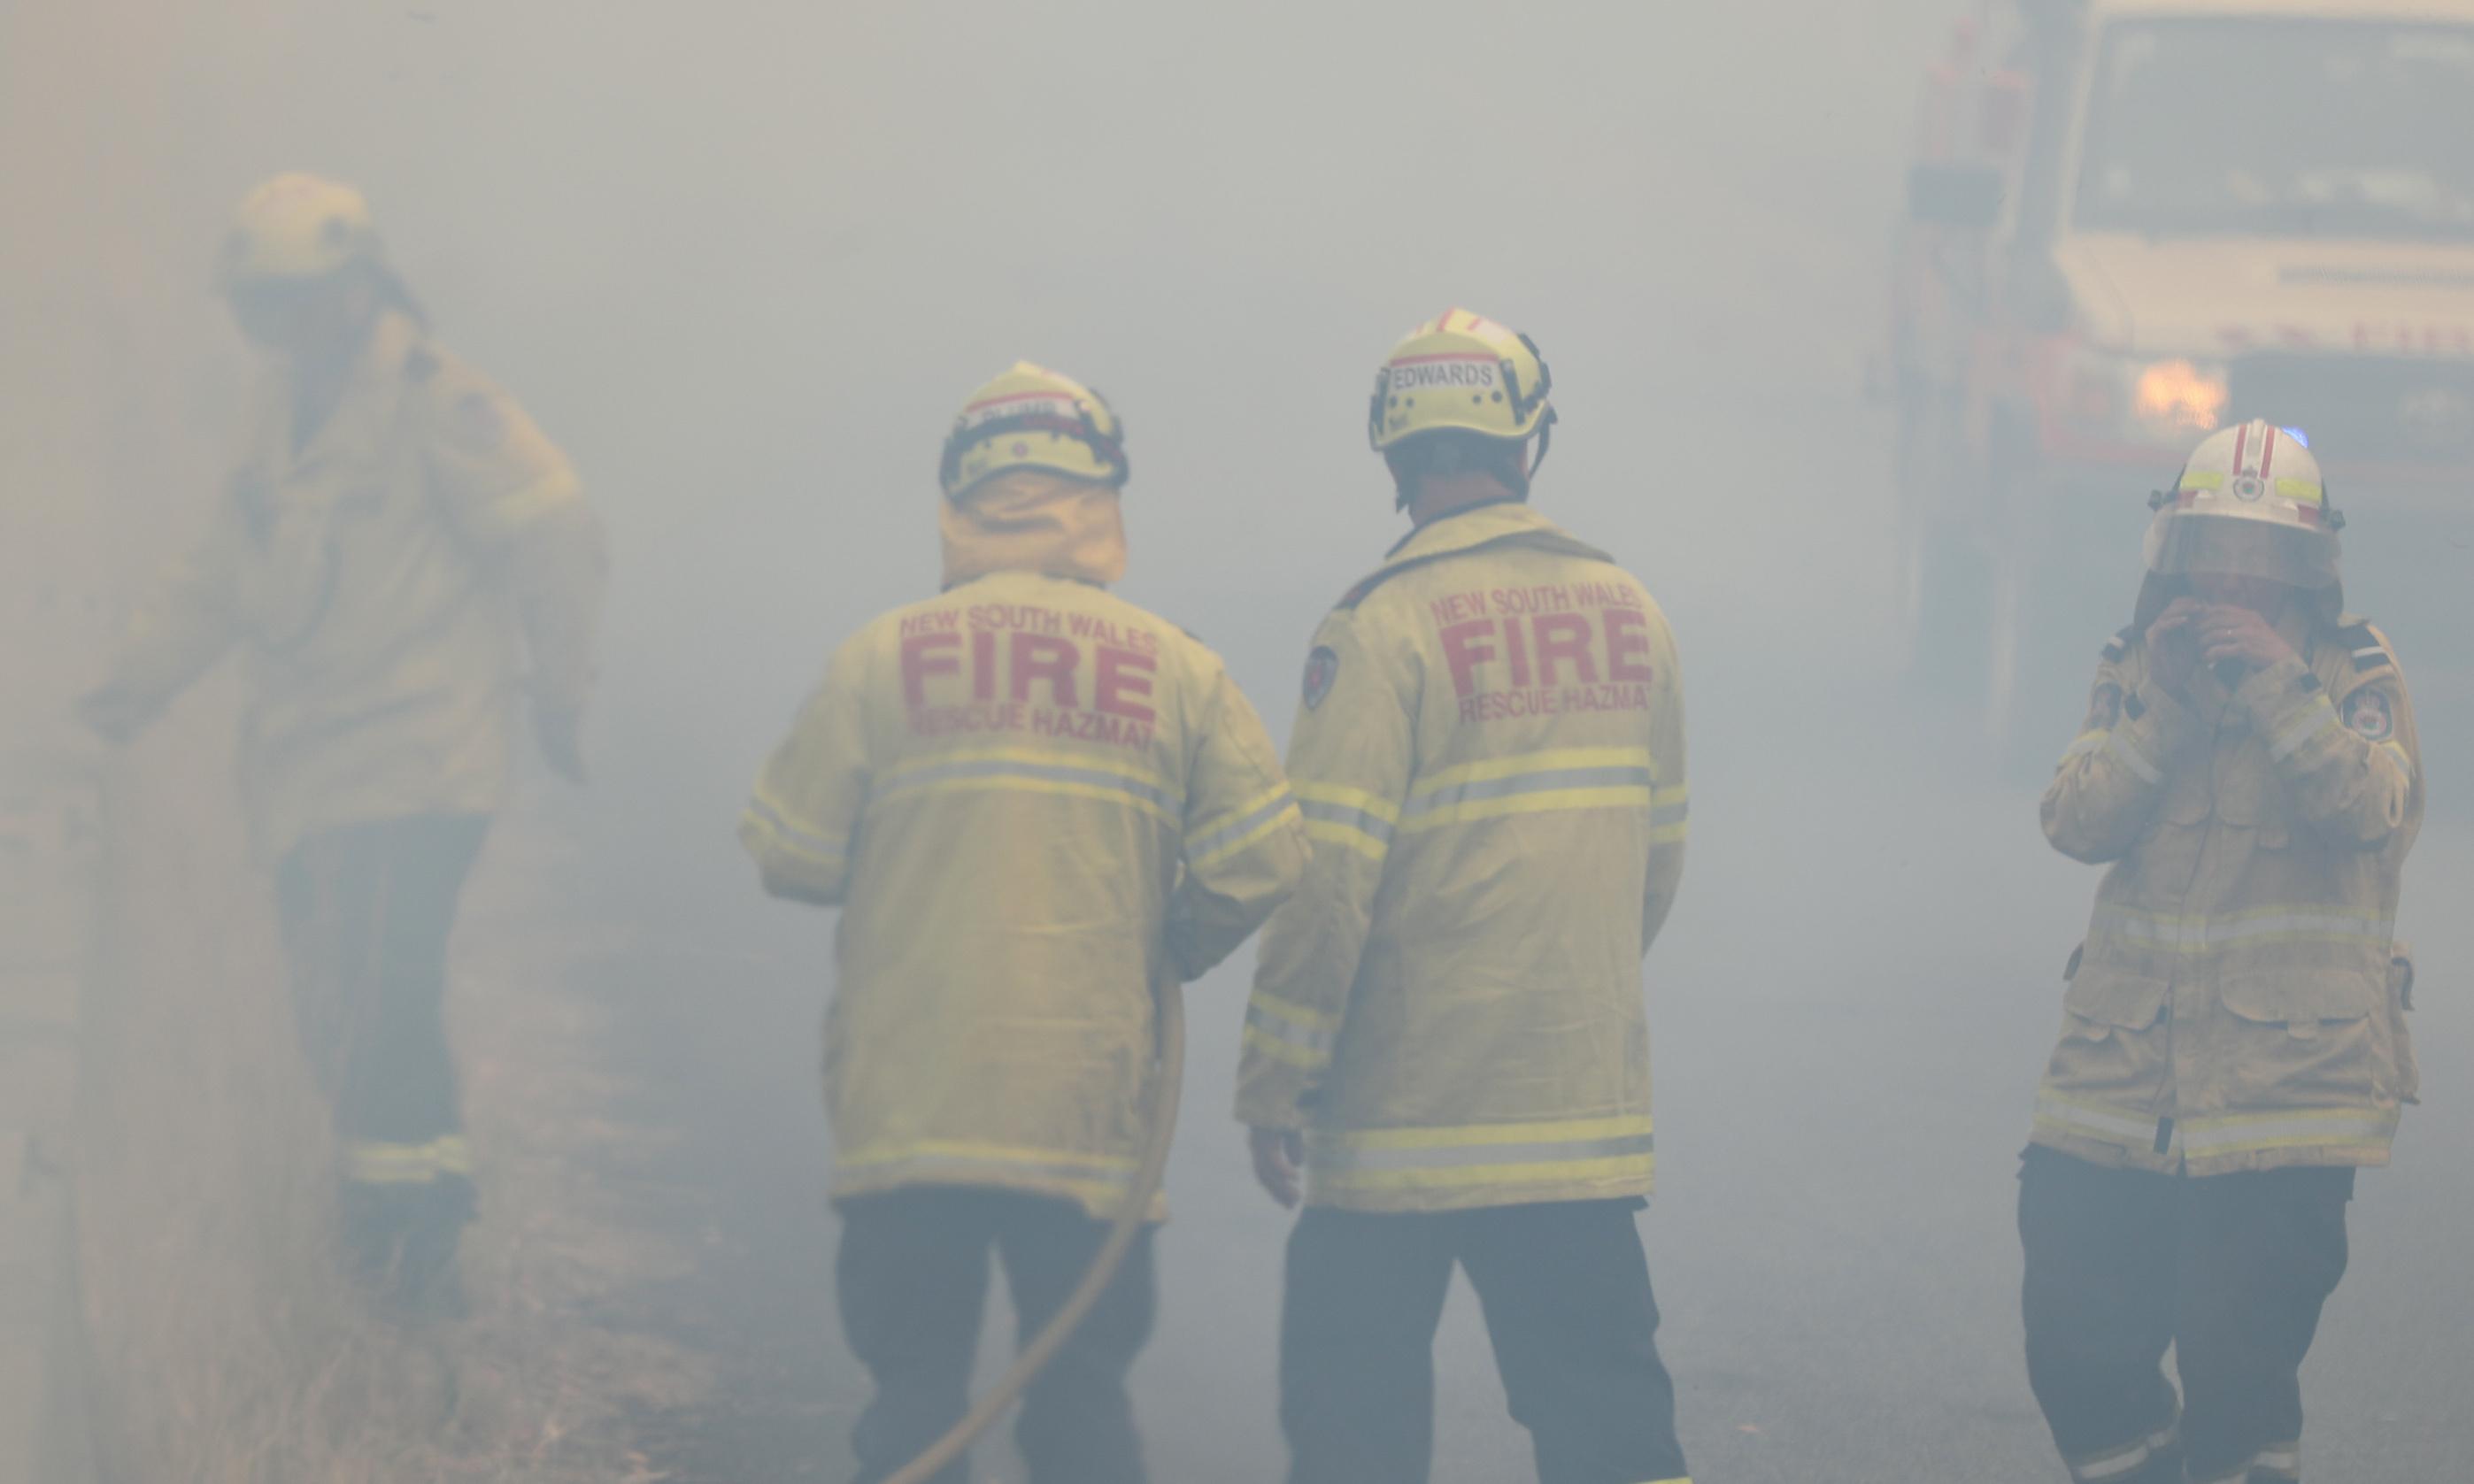 Morning mail: bushfire crisis, far-right plot revealed, Hong Kong flare-up